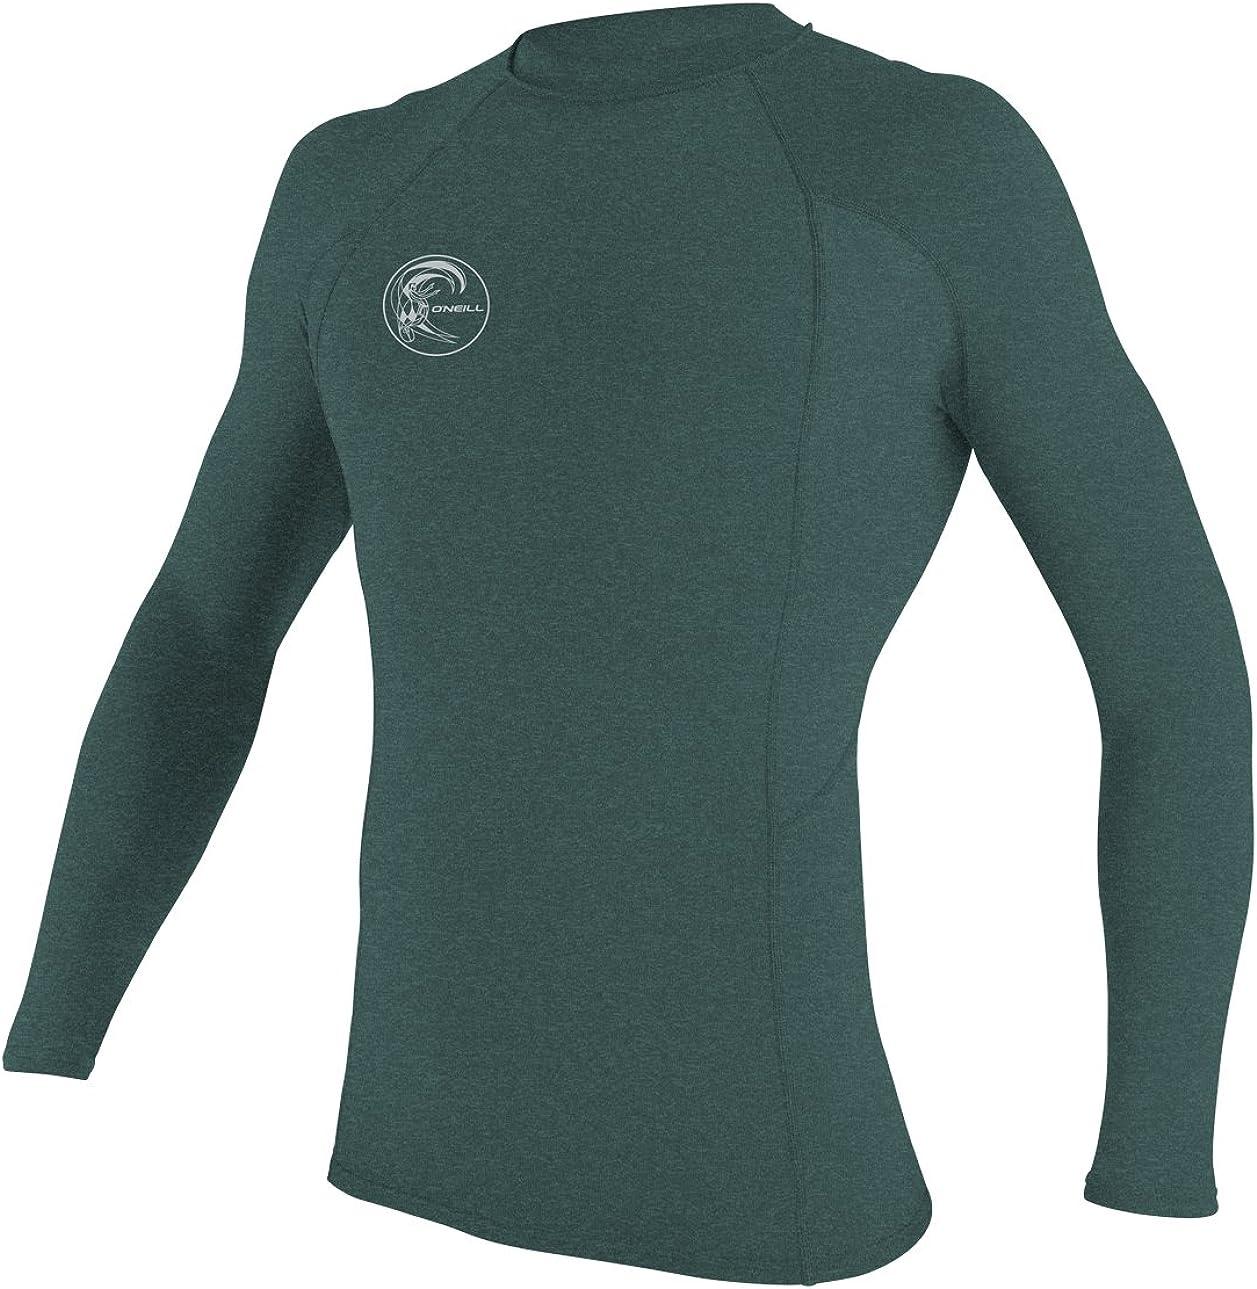 O'Neill UV Sun Financial sales sale Protection Mens Long Hybrid Crew Shirt Super sale Sleeve